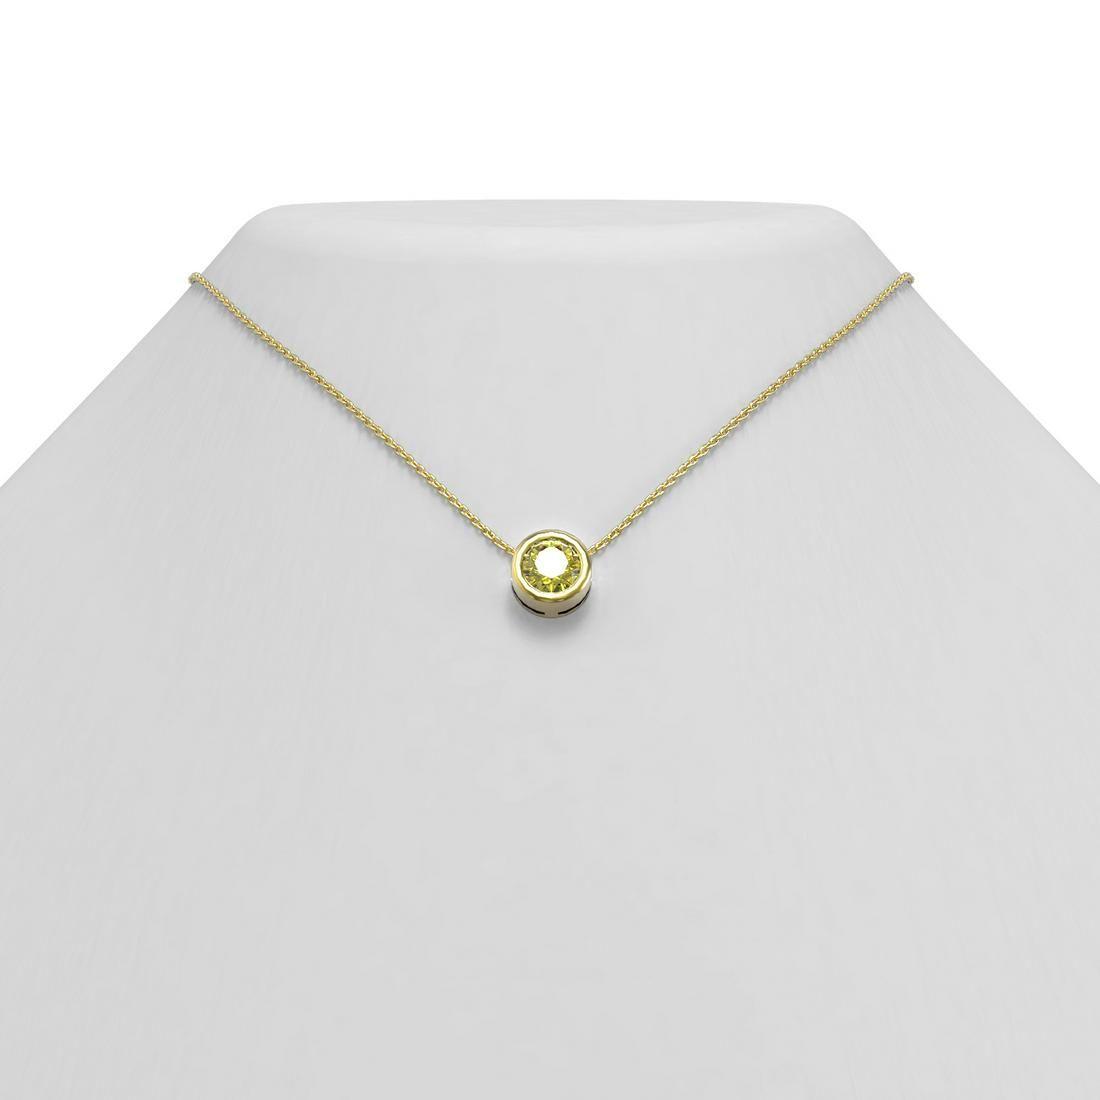 1 ctw Fancy Yellow Diamond Necklace 18K Yellow Gold -